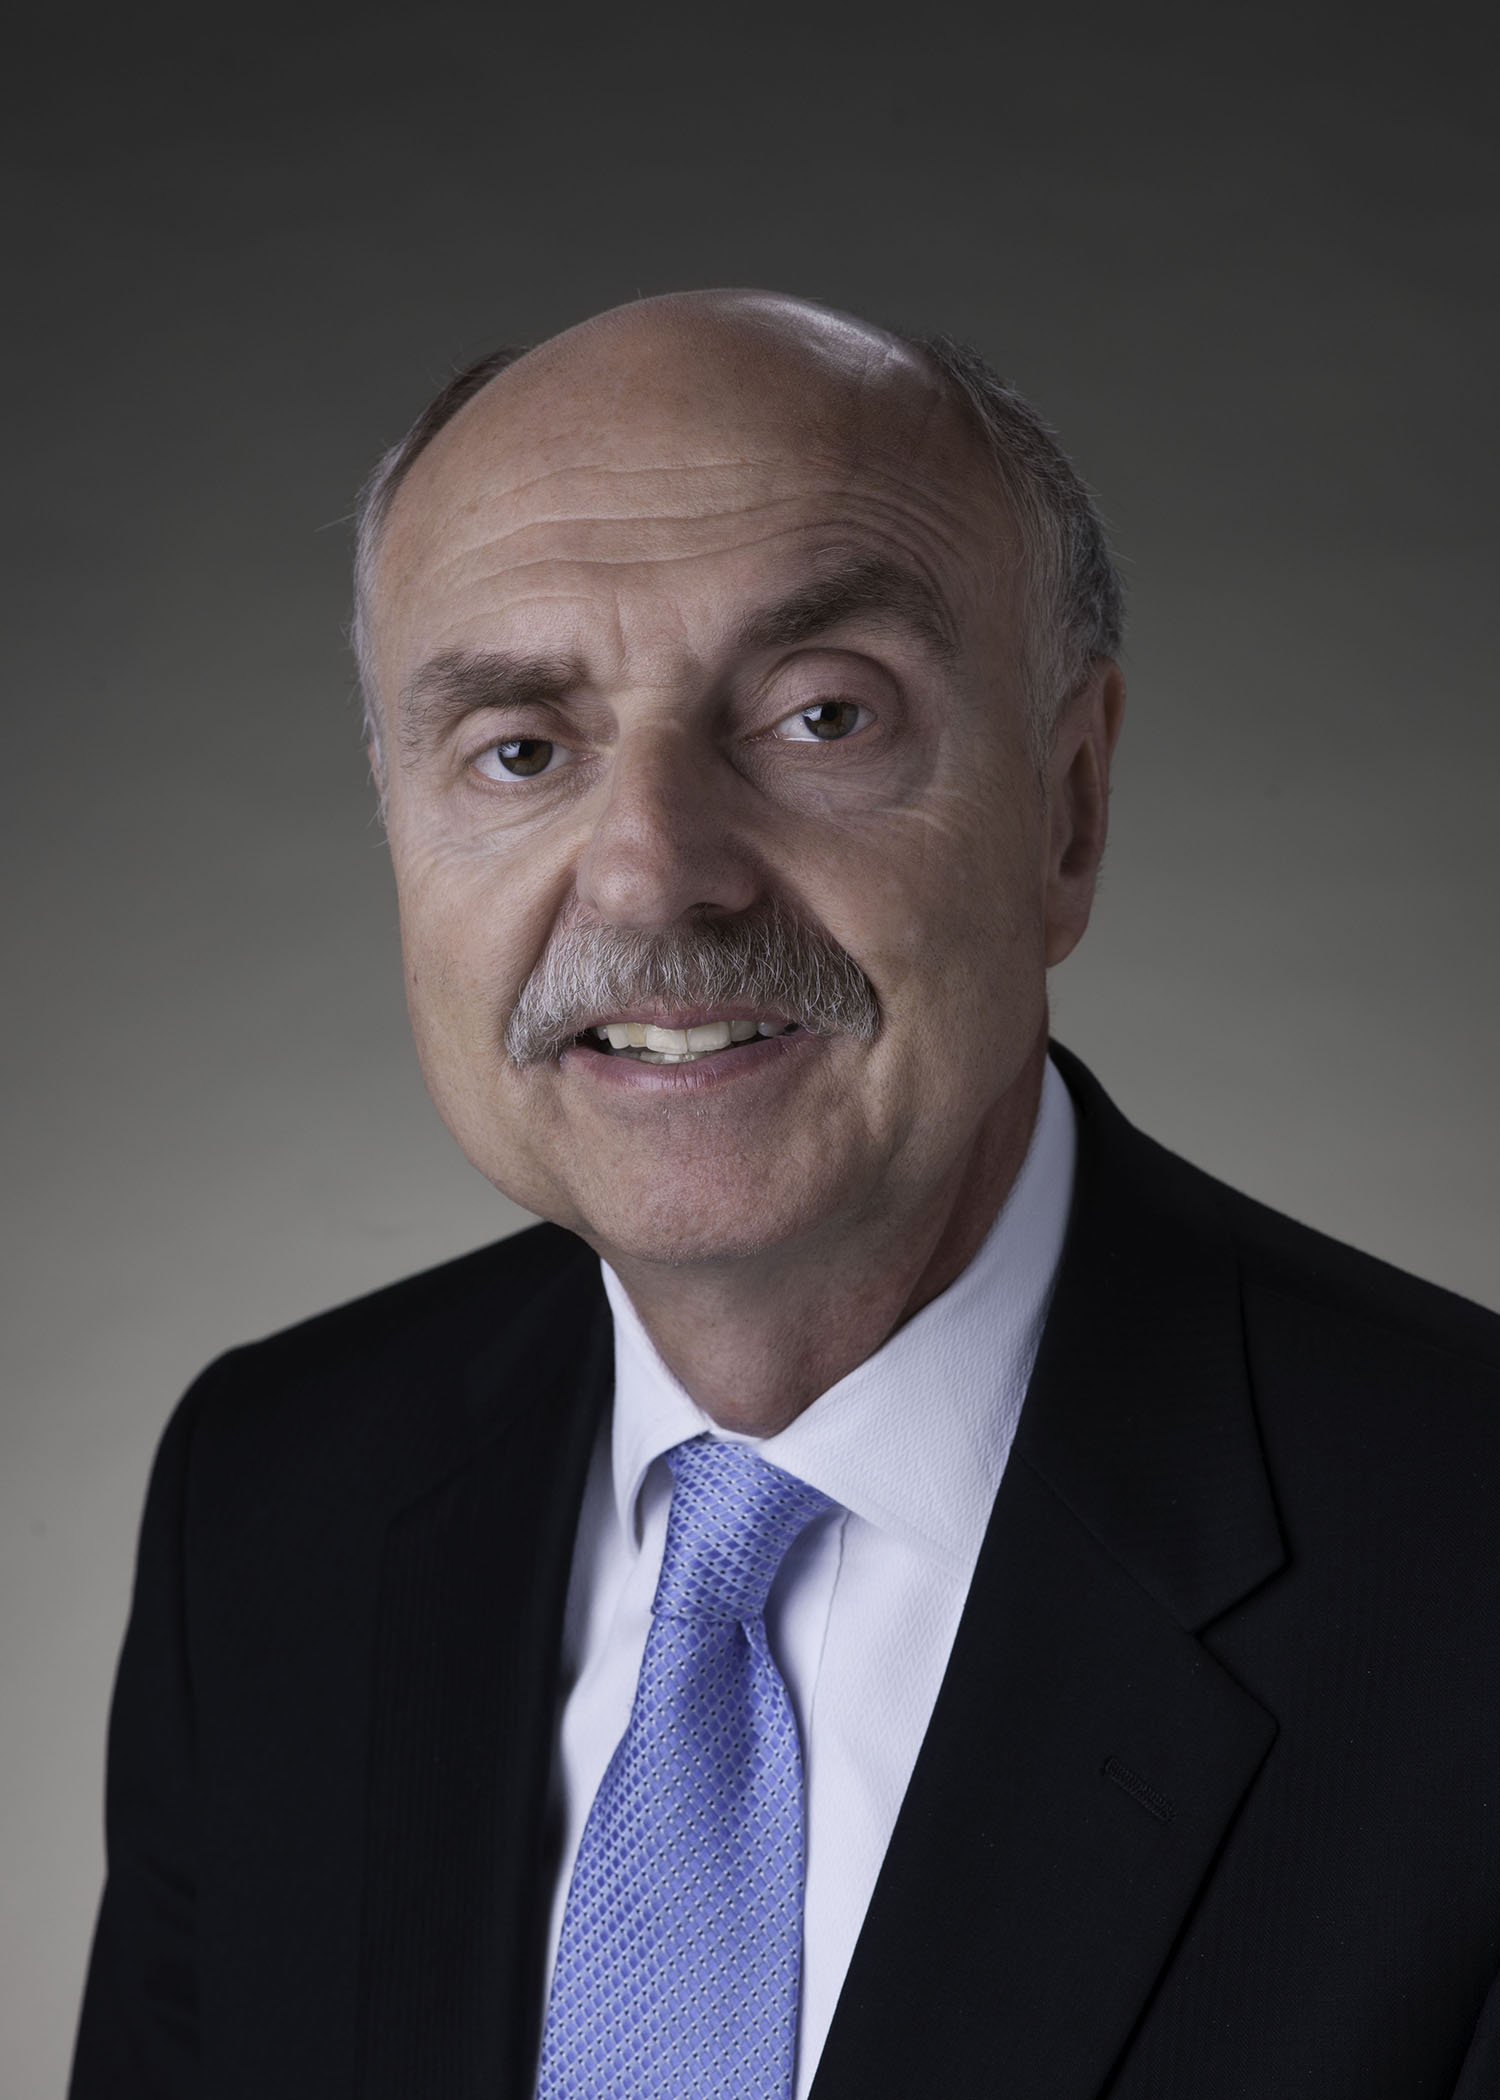 Alexander R. Domanskis